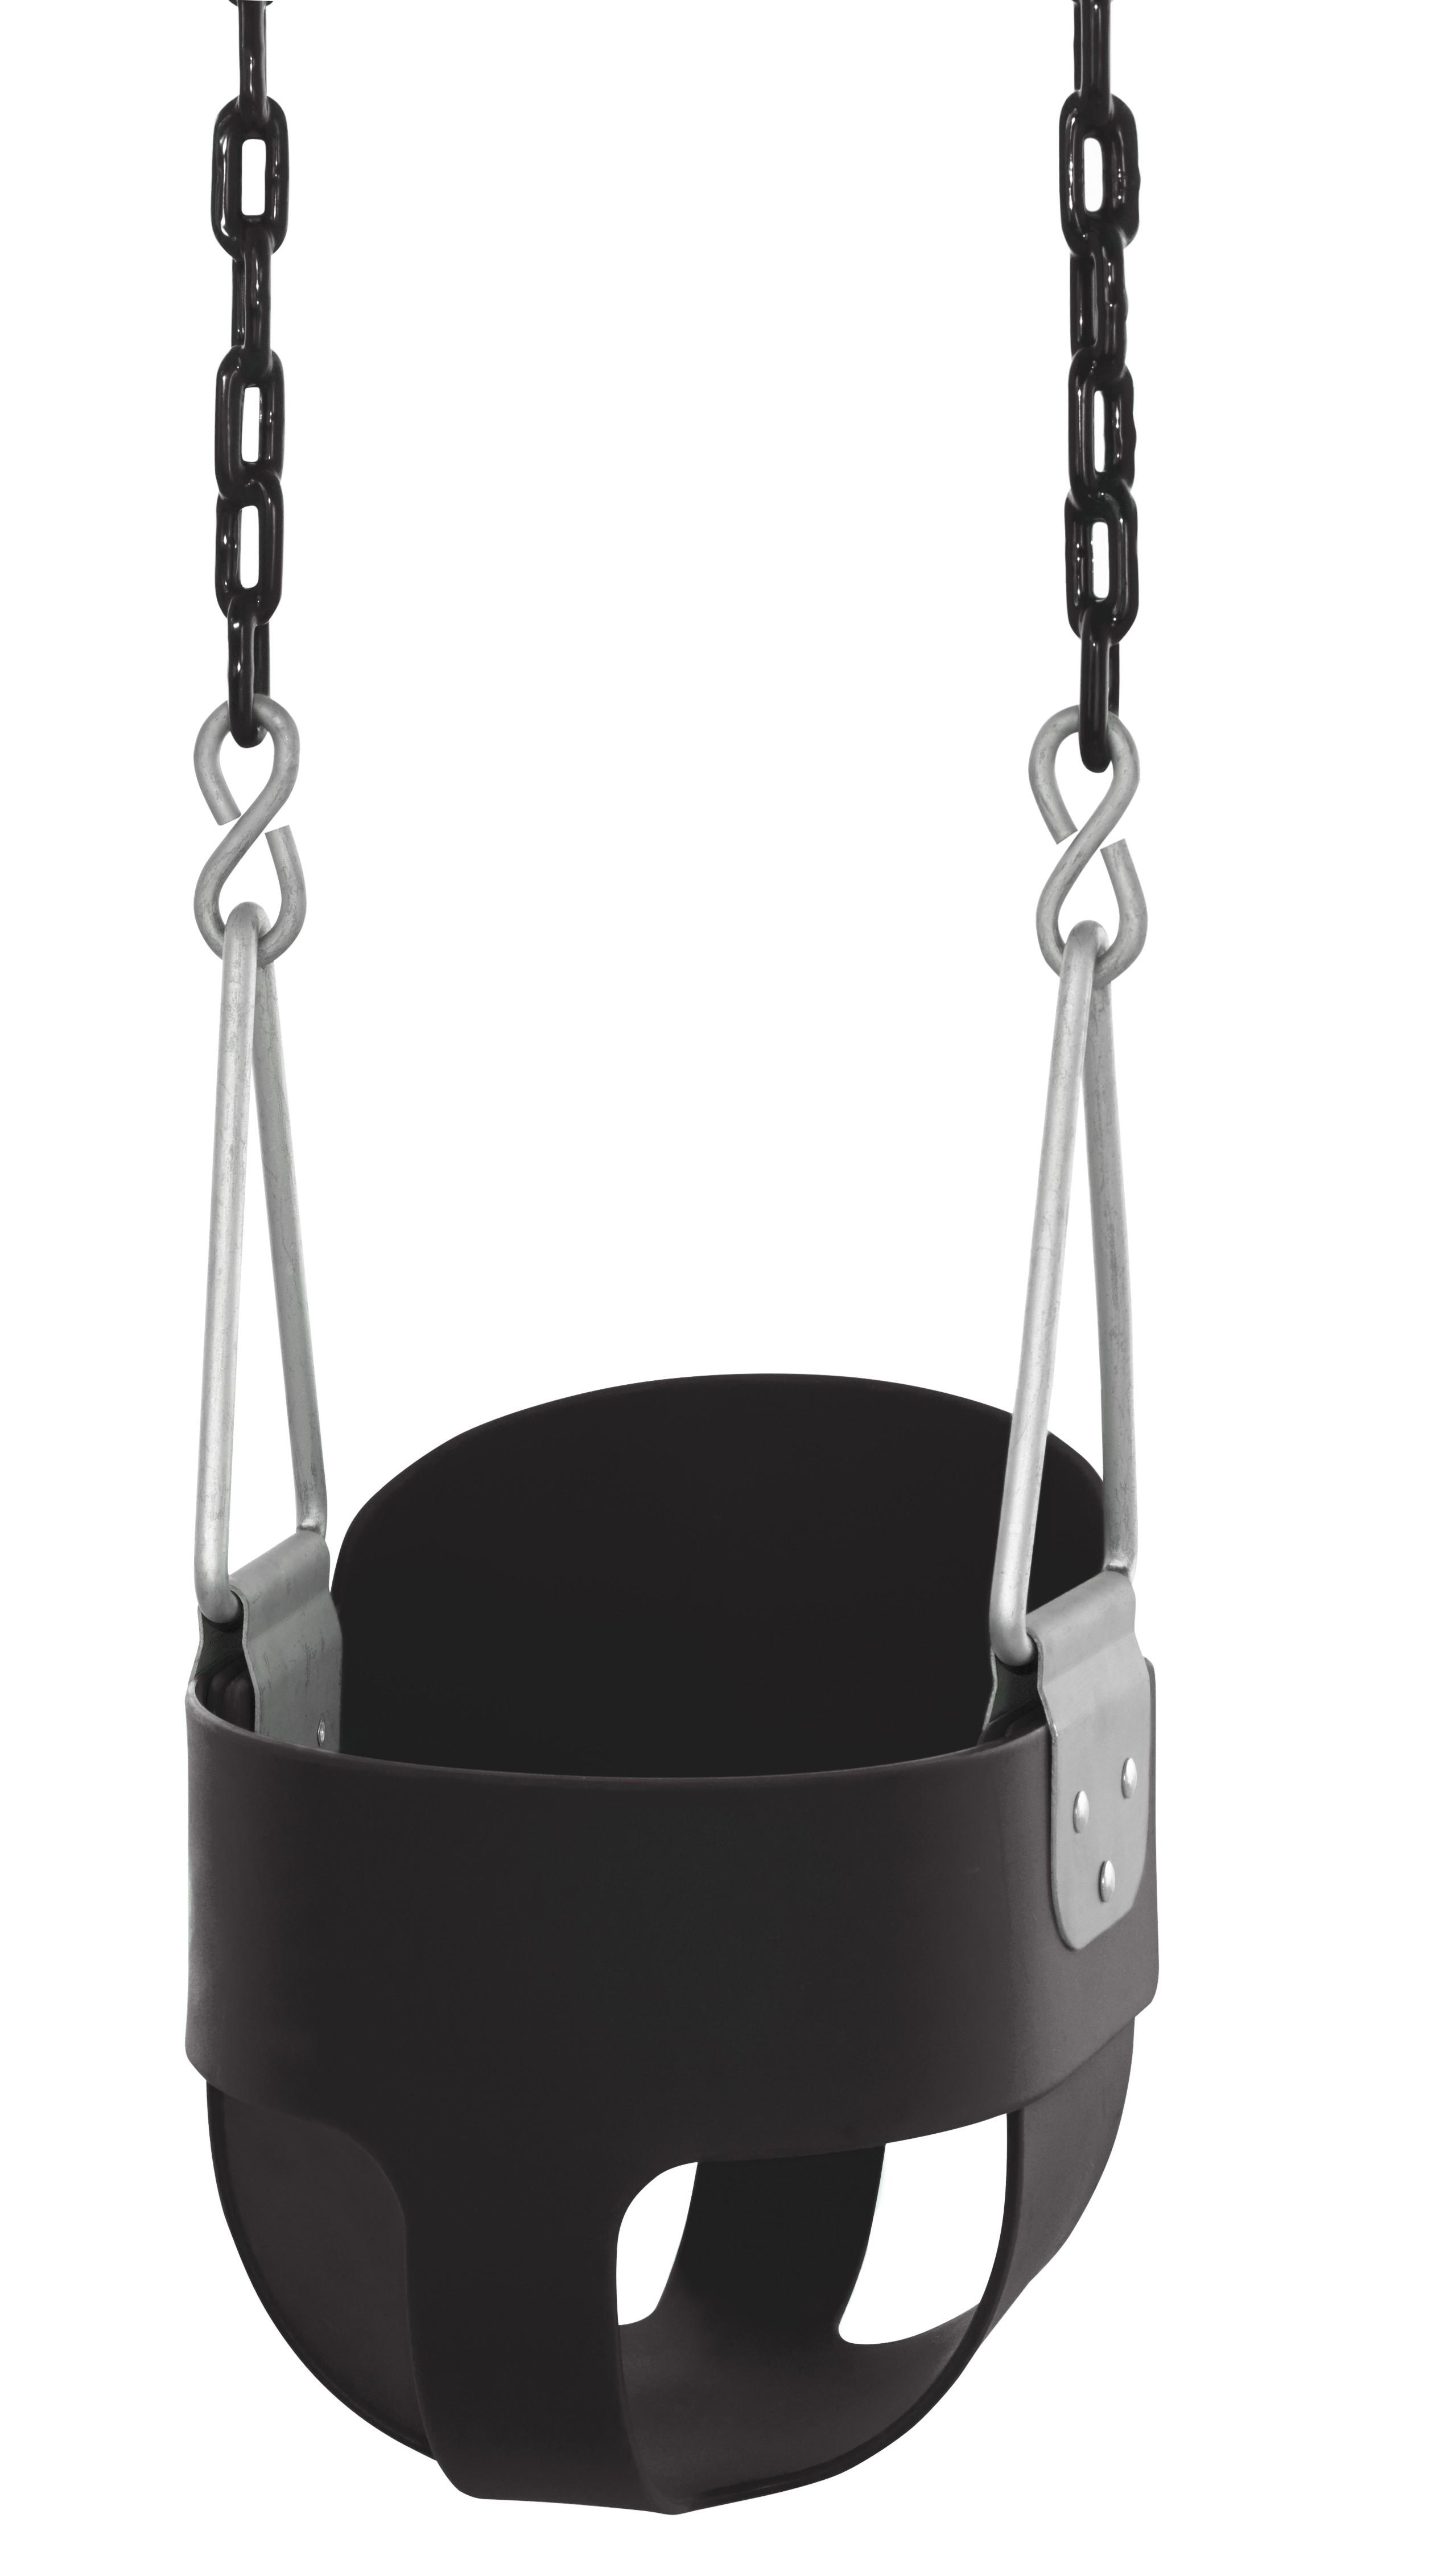 Swingan - High Back, Full Bucket Toddler & Baby Swing - Vinyl Coated Chain - Fully Assembled - Black